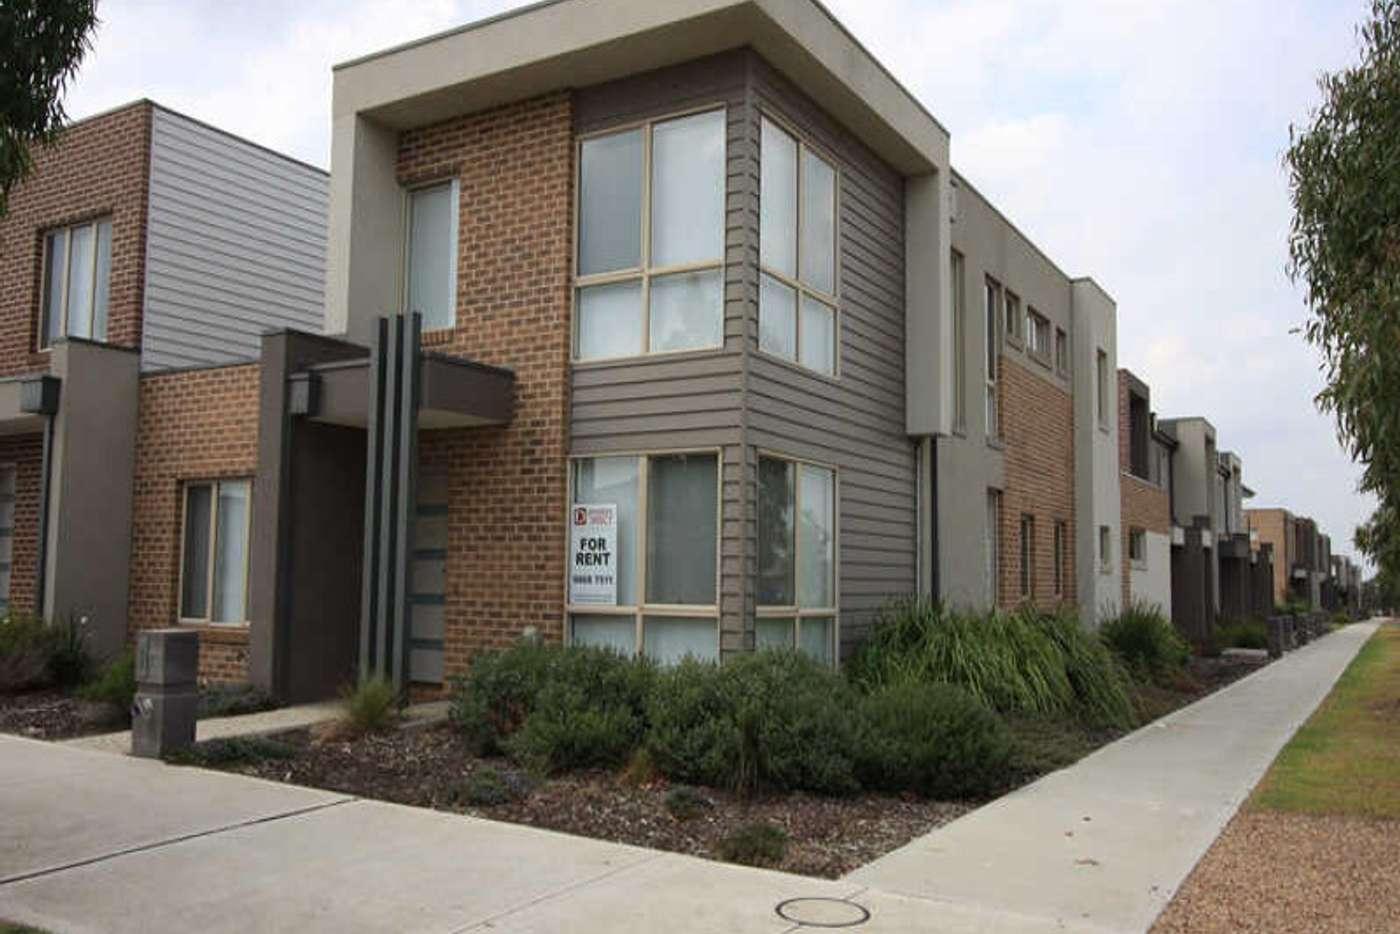 Main view of Homely townhouse listing, 180 Newbury Boulevard, Craigieburn VIC 3064